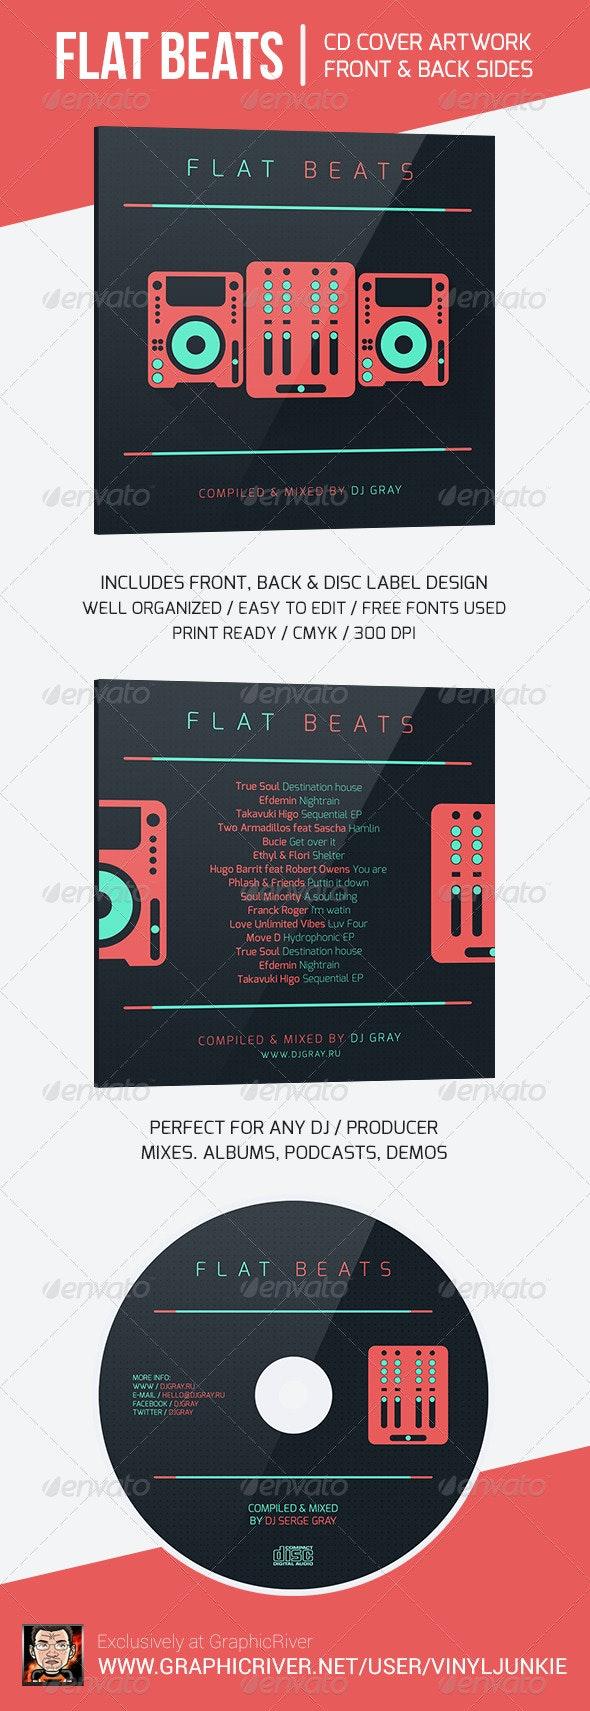 Flat Beats - DJ Mix CD Cover Artwork Template - CD & DVD Artwork Print Templates